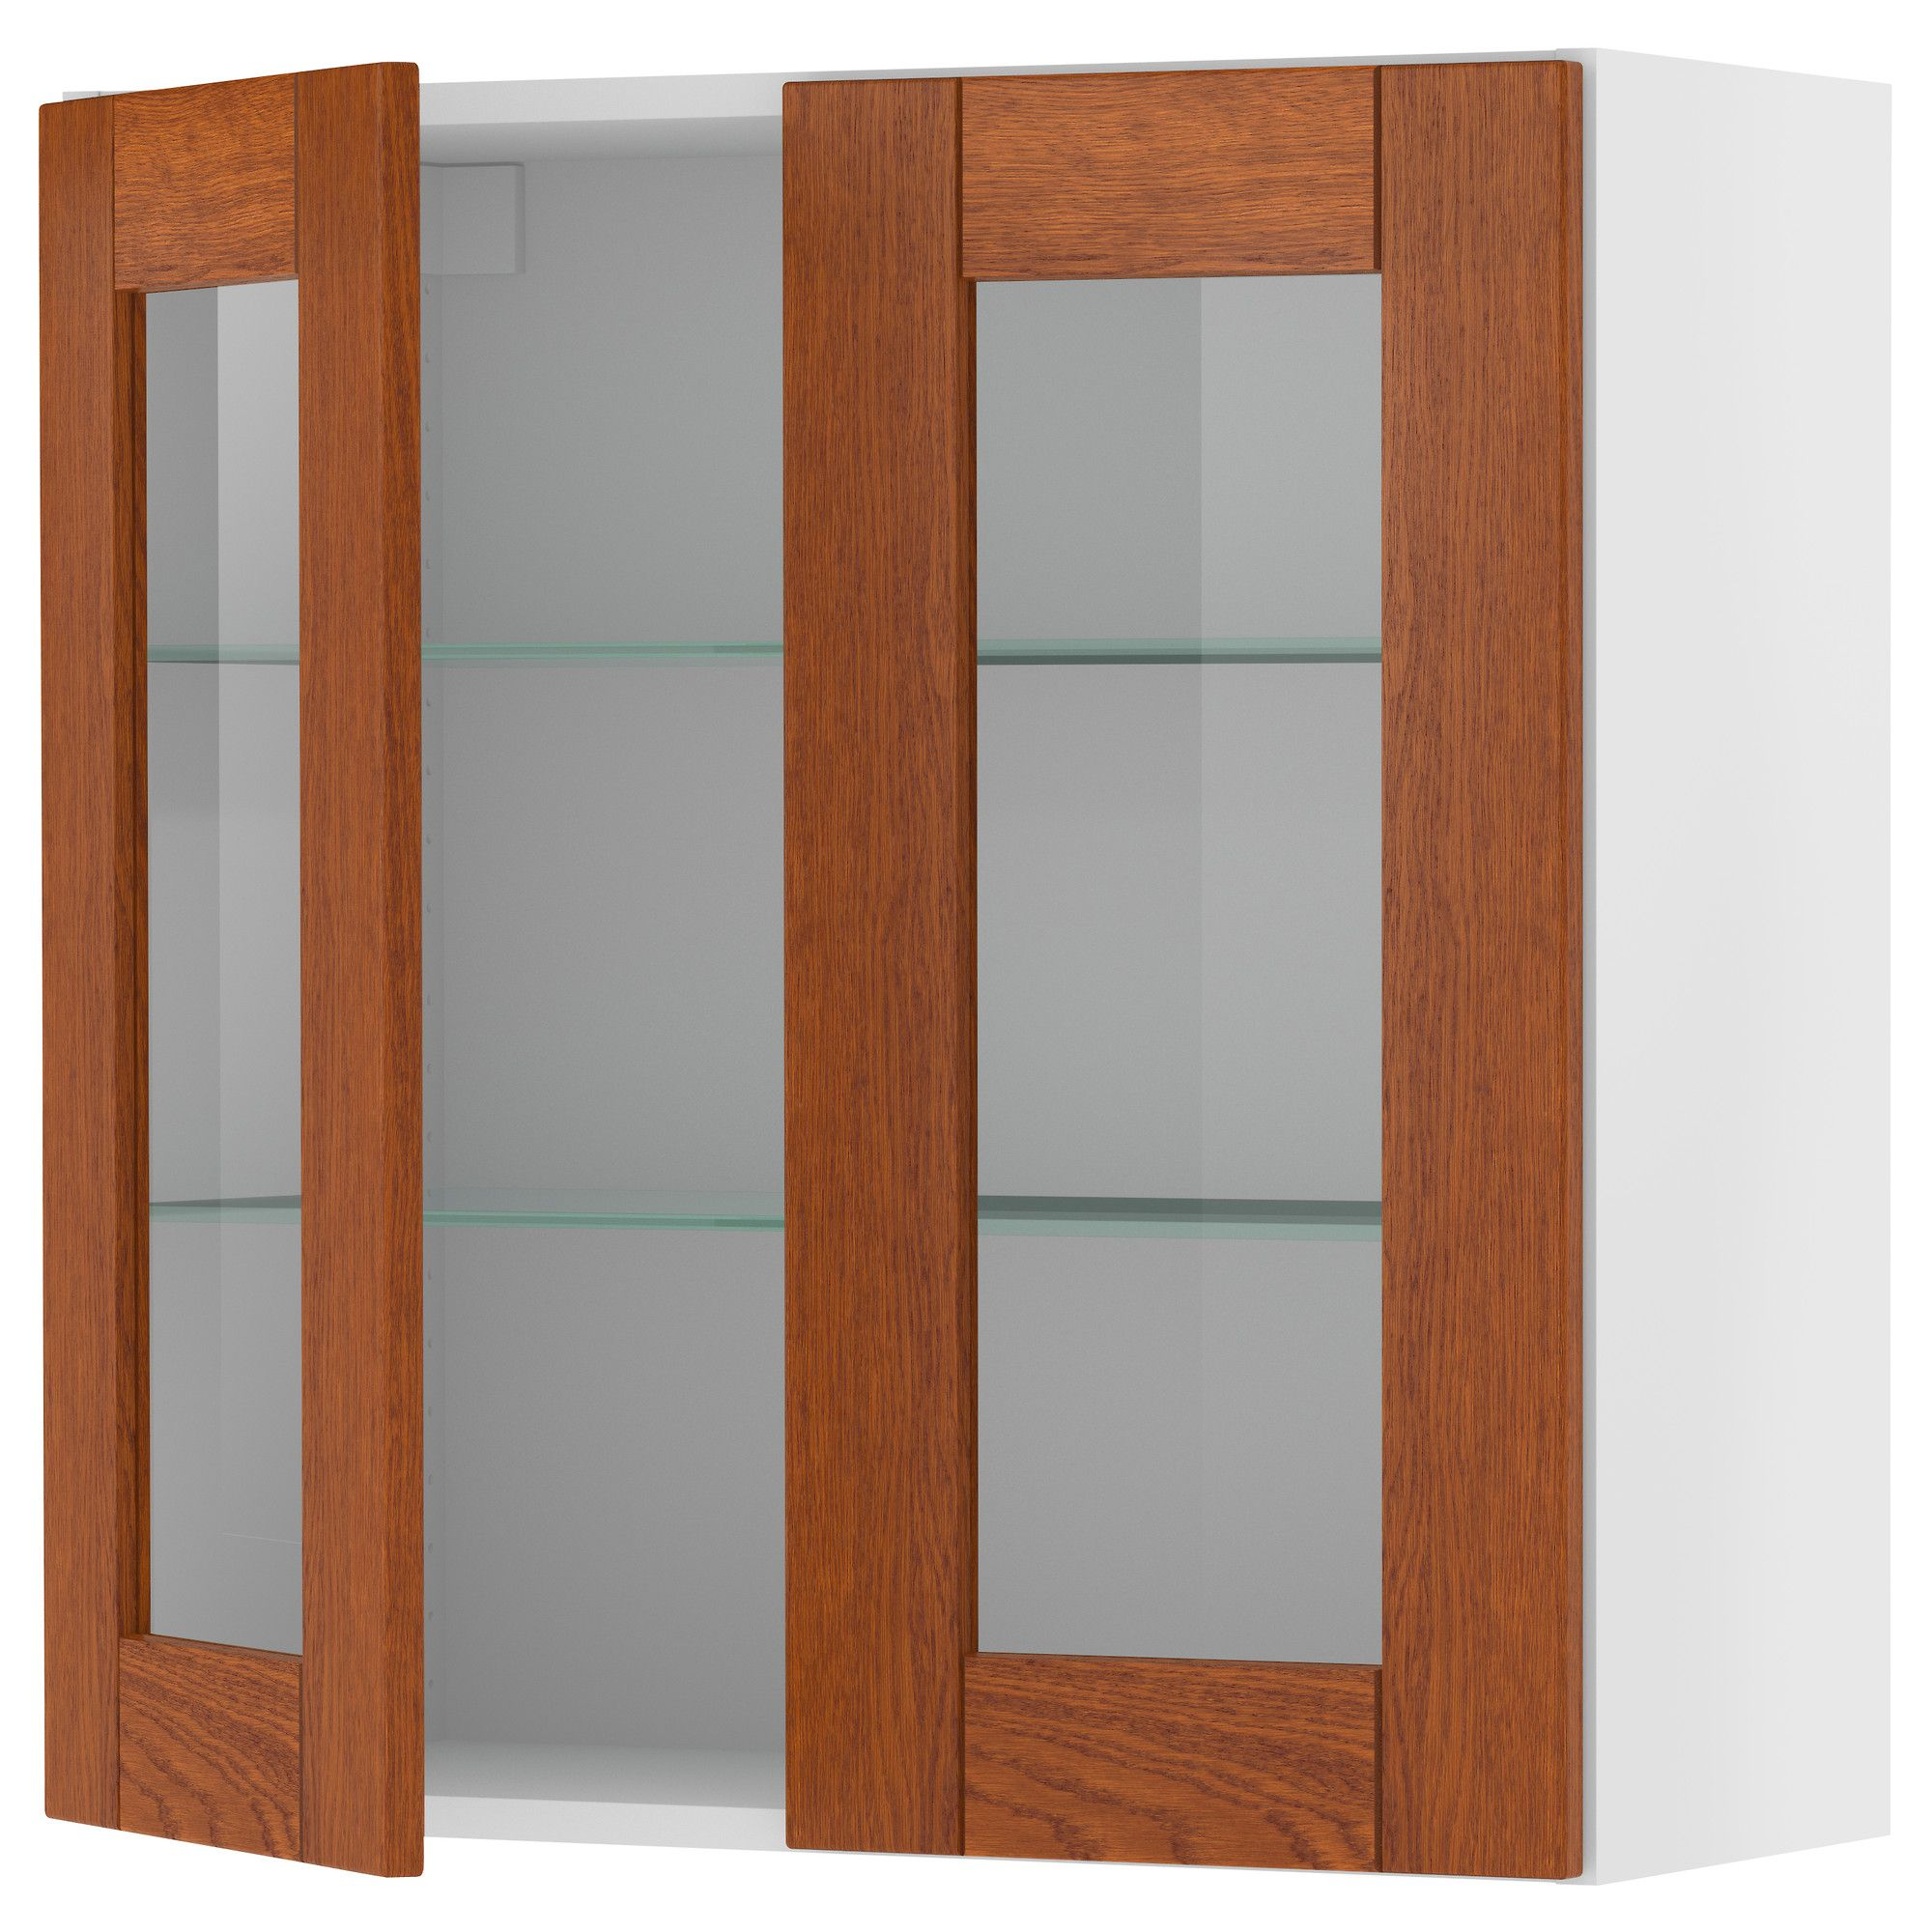 Akurum Wall Cabinet With 2 Glass Doors Birch Effect Lixtorp Brown 30x30 Ikea Little Free